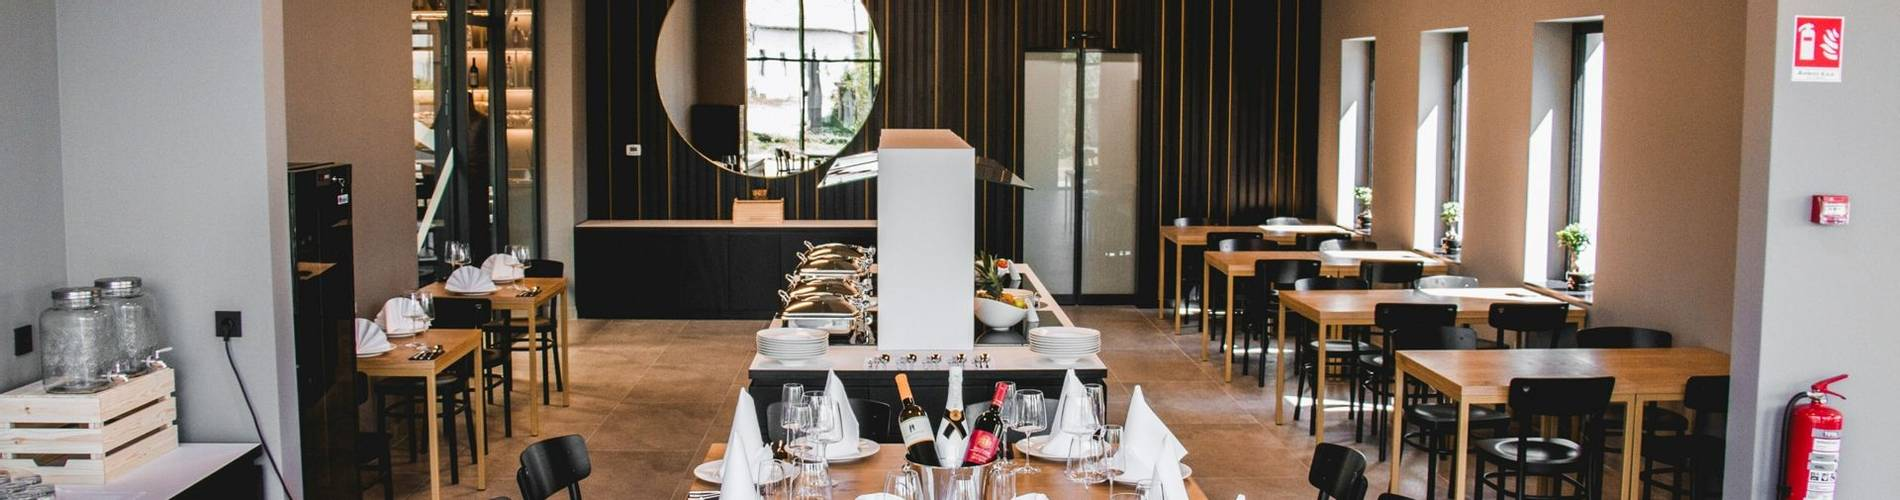 Hotel_Lyra_Plitvice_Restaurant_5.jpg